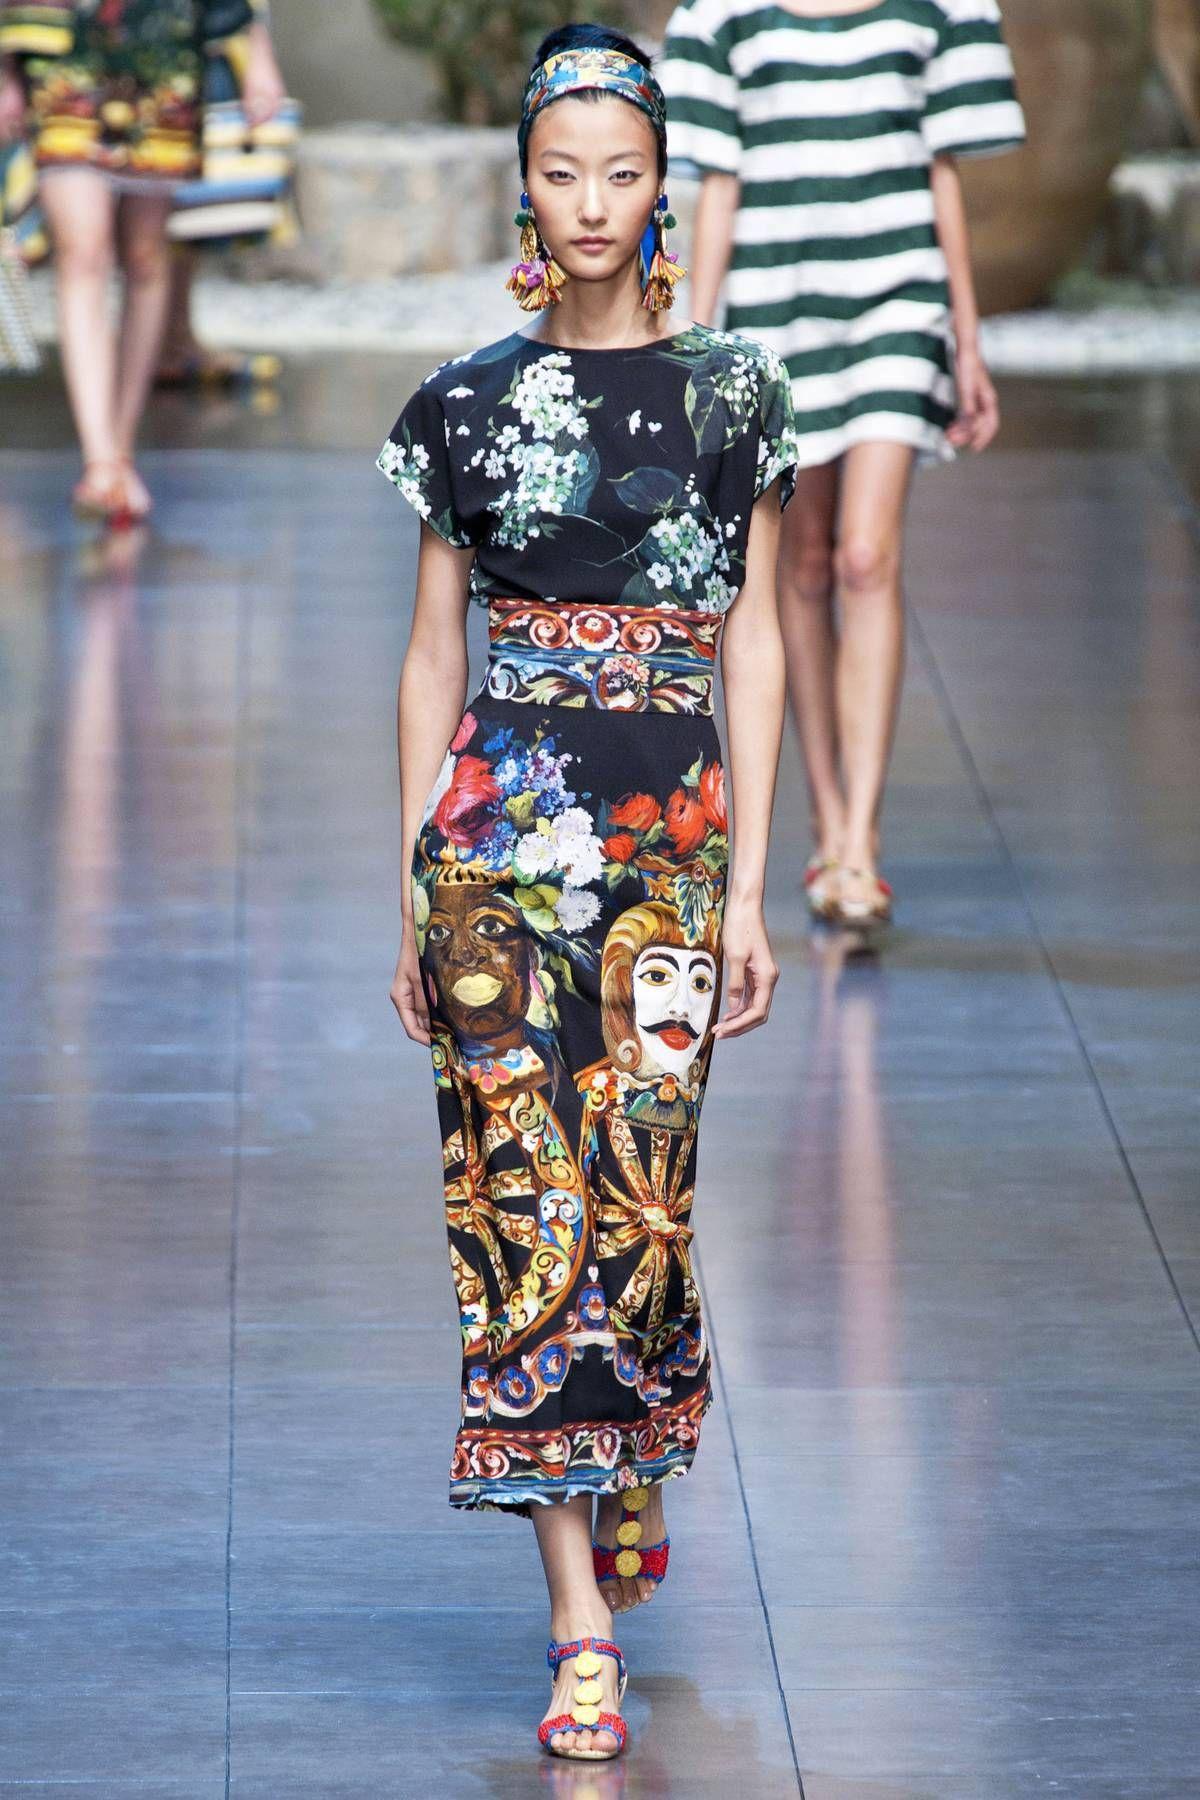 Pin on Fashion Spring/Summer